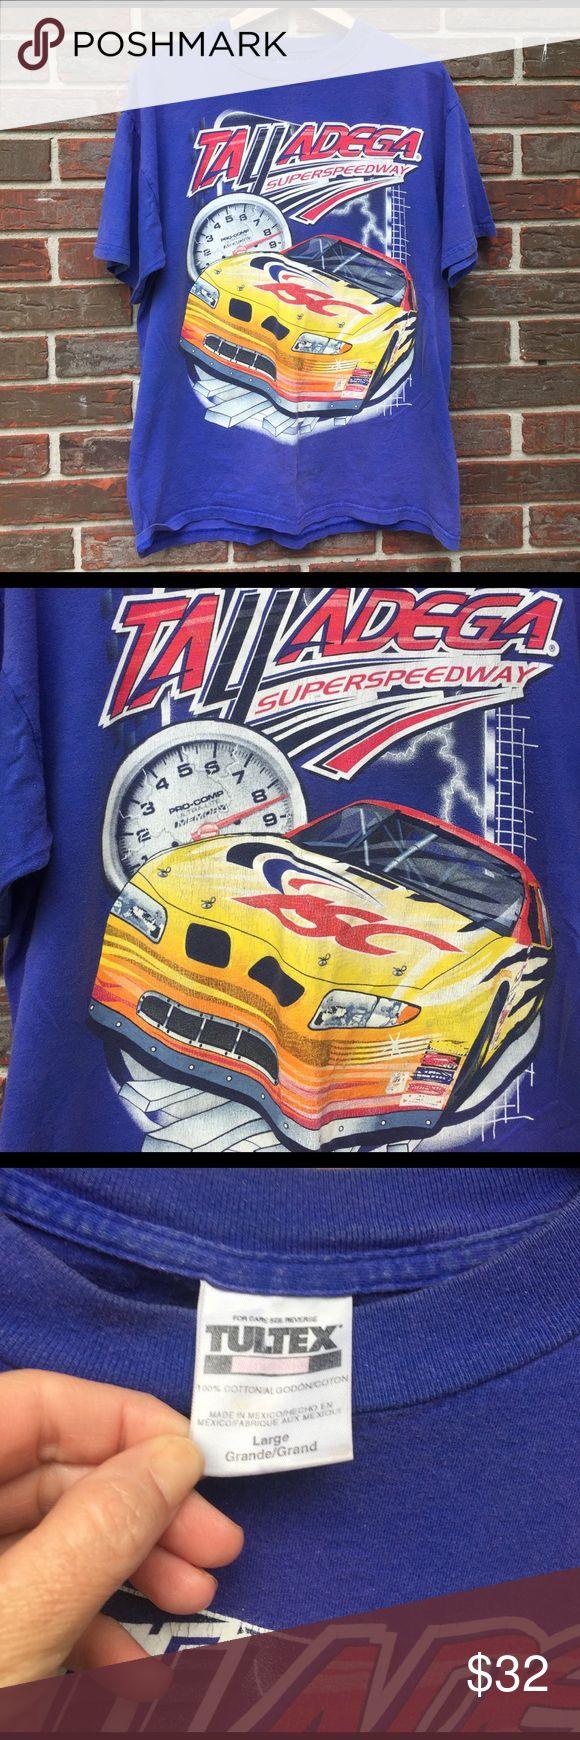 🏁 Vintage Talladega Super speedway NASCAR shirt Faded indigo color. Men's size large. Still in good condition! 2000 Talladega Super speedway NASCAR shirt. Great collectors item for race fan 🏁 Vintage Shirts Tees - Short Sleeve